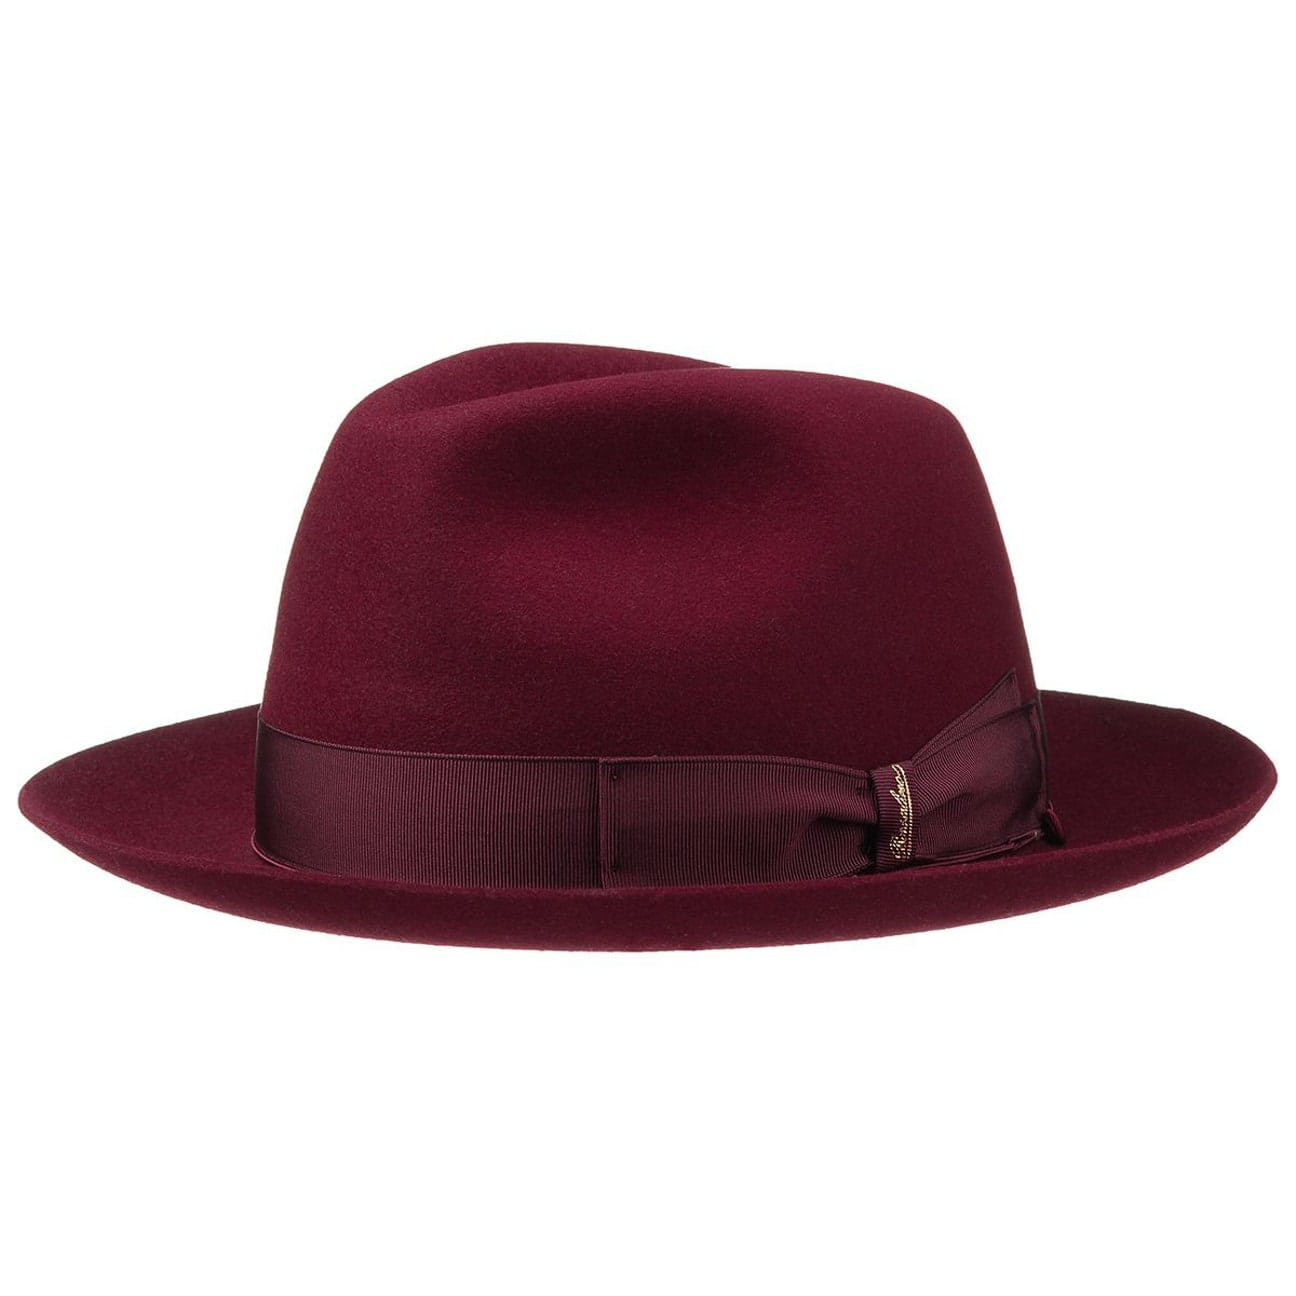 2e08d8dae9c33 ... Classic Hat by Borsalino - bordeaux 5 ...